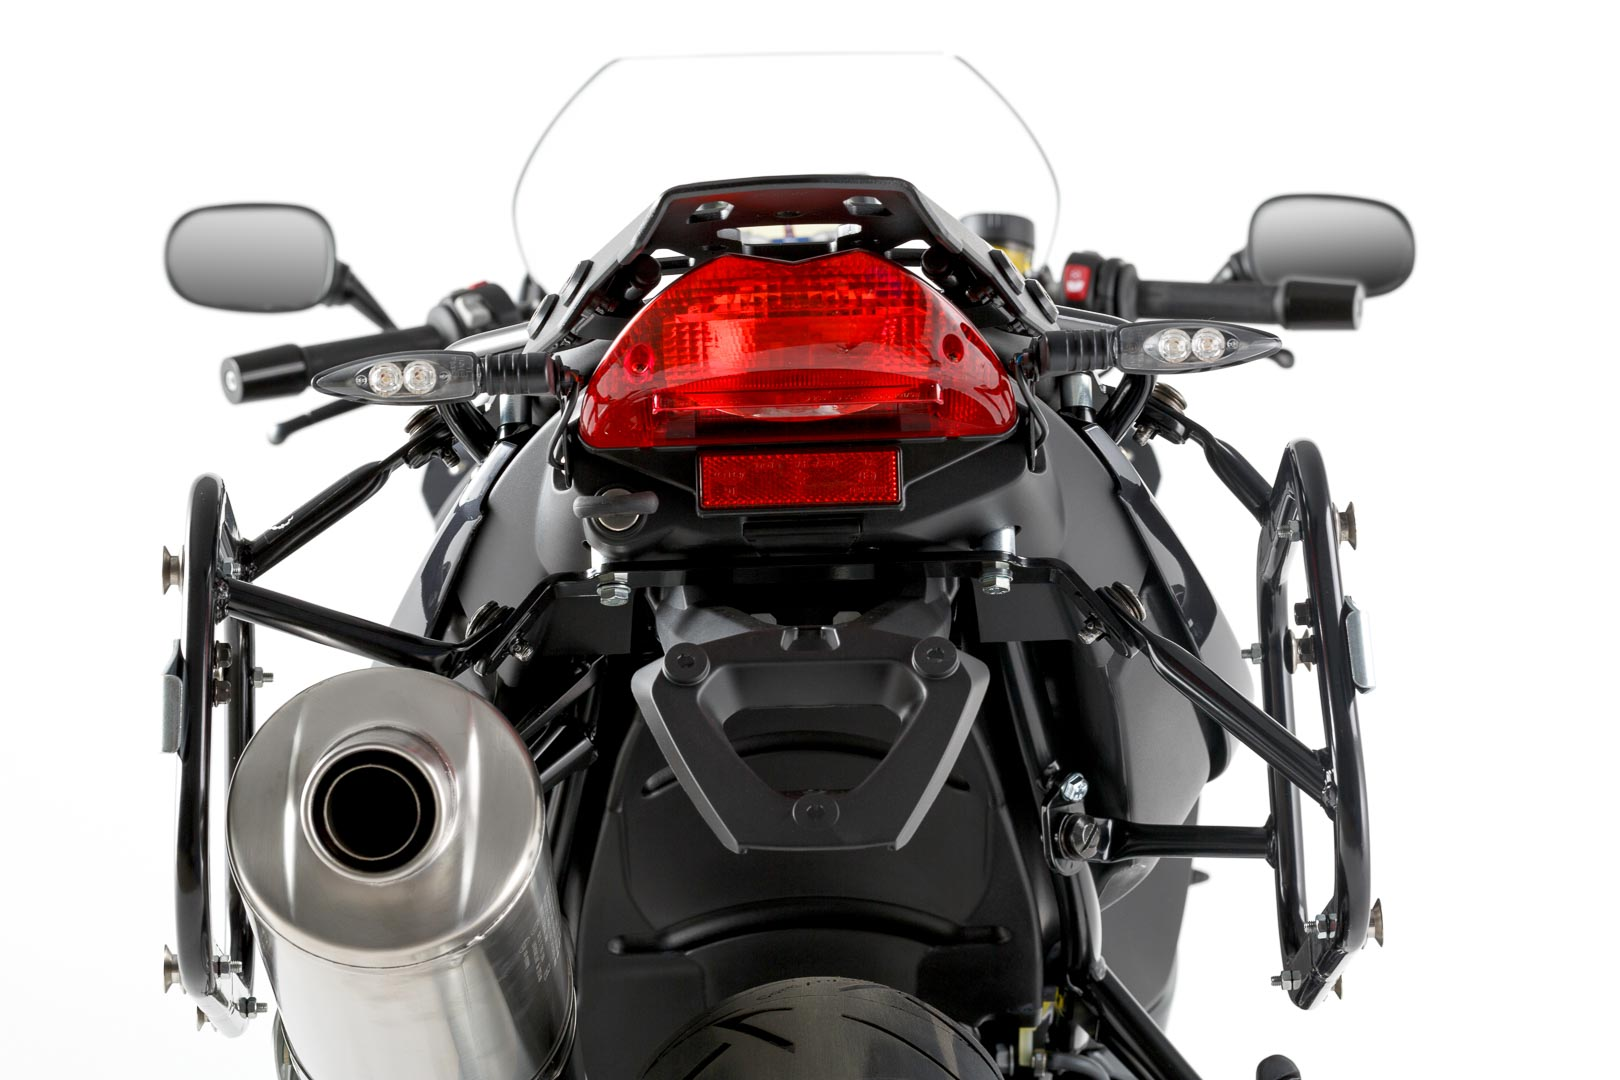 SW-Motech Quick-Lock Evo sivutelinesarja BMW F800R 09-